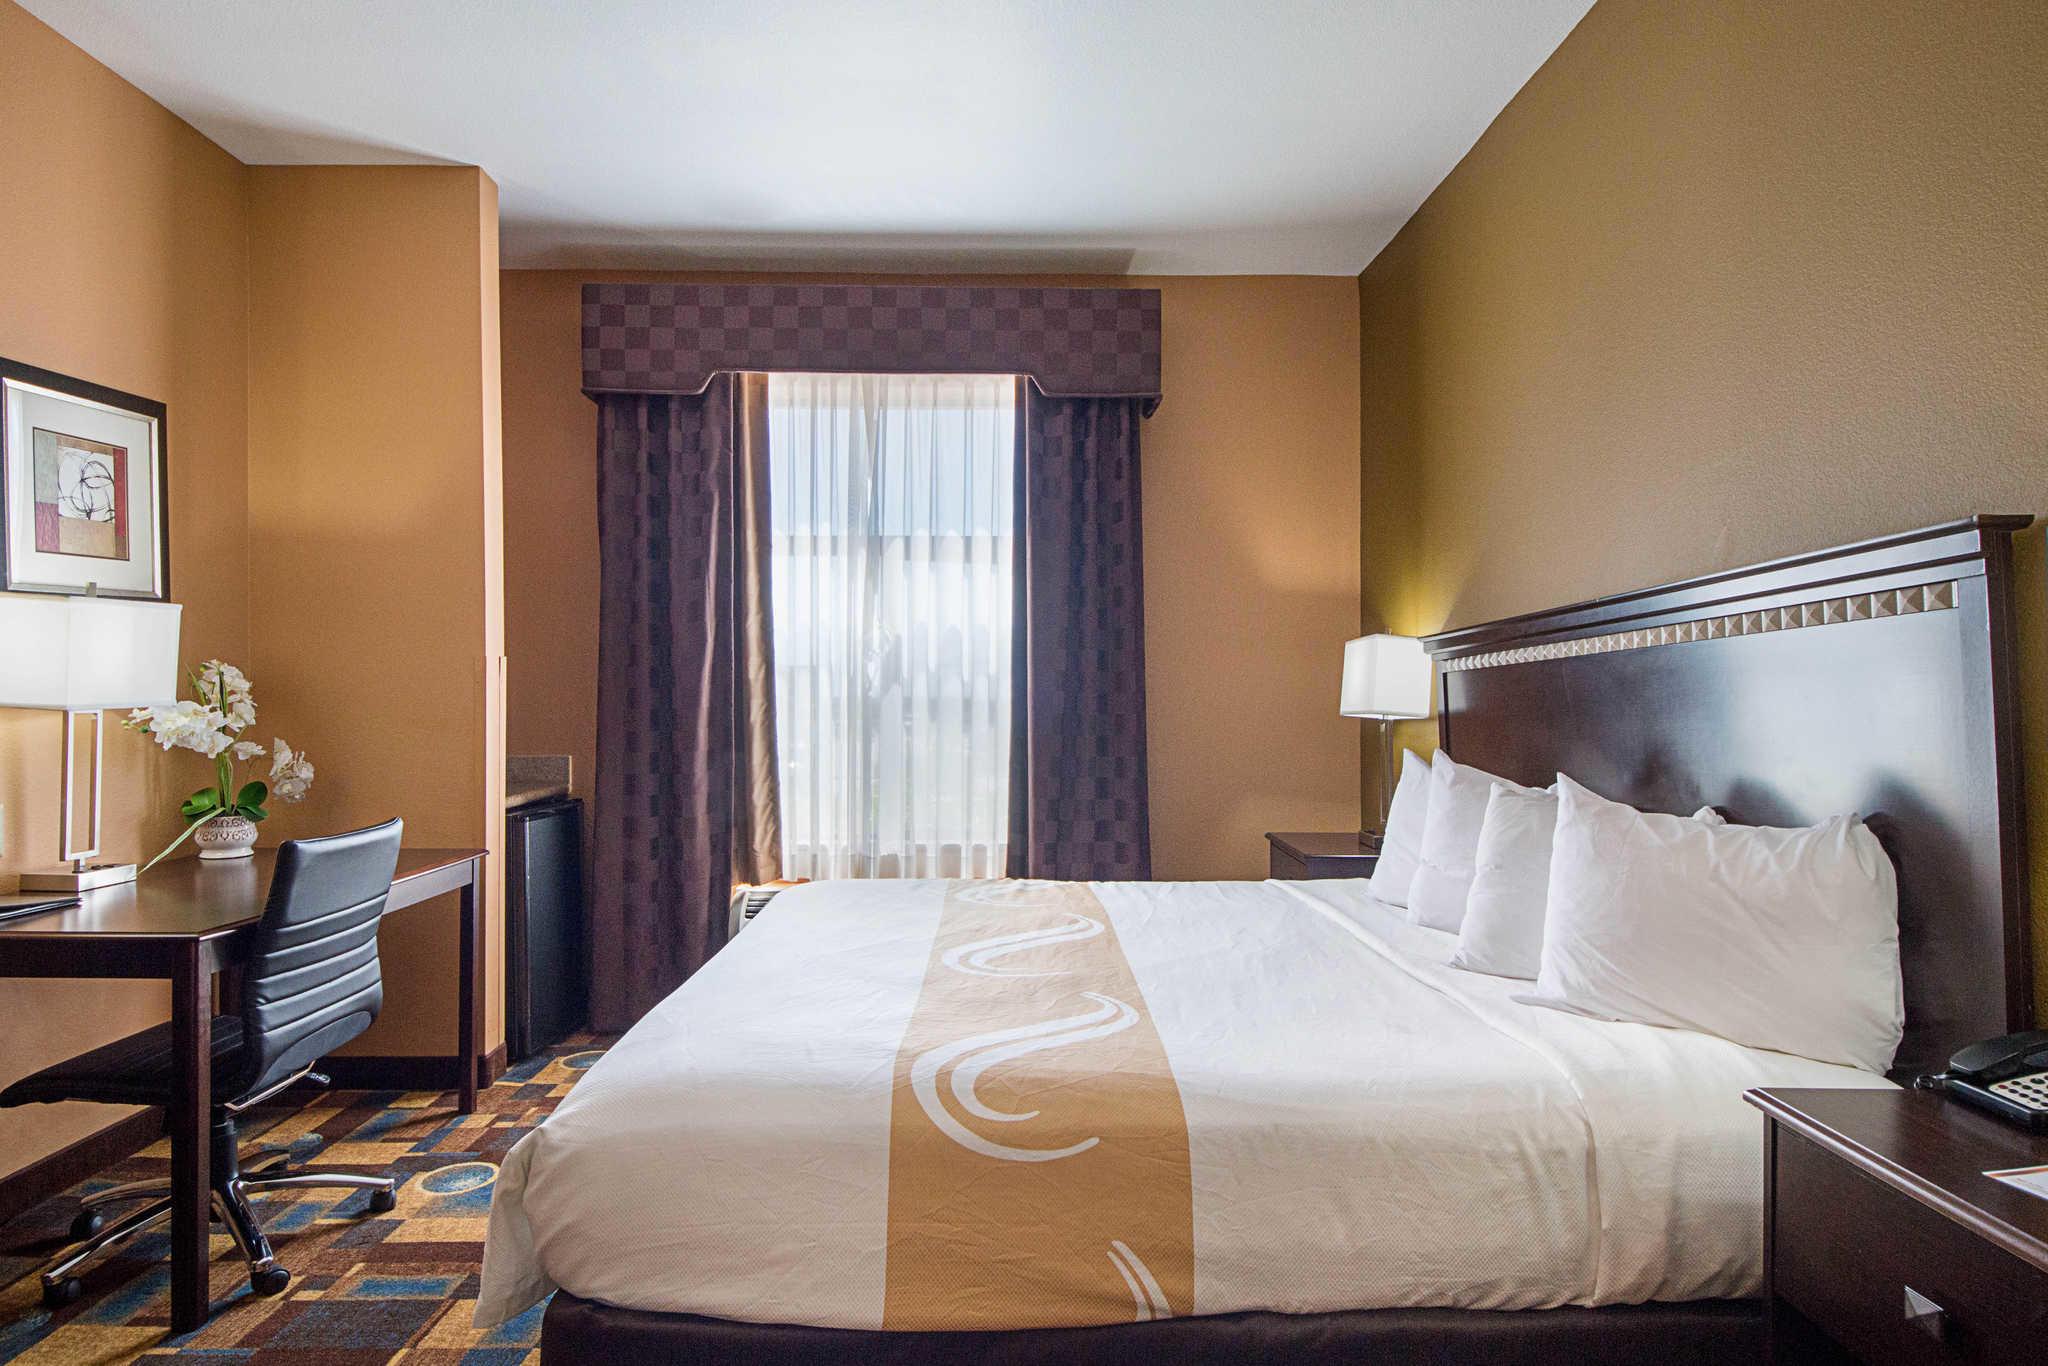 Quality Inn Amp Suites Hotels Buda Texas